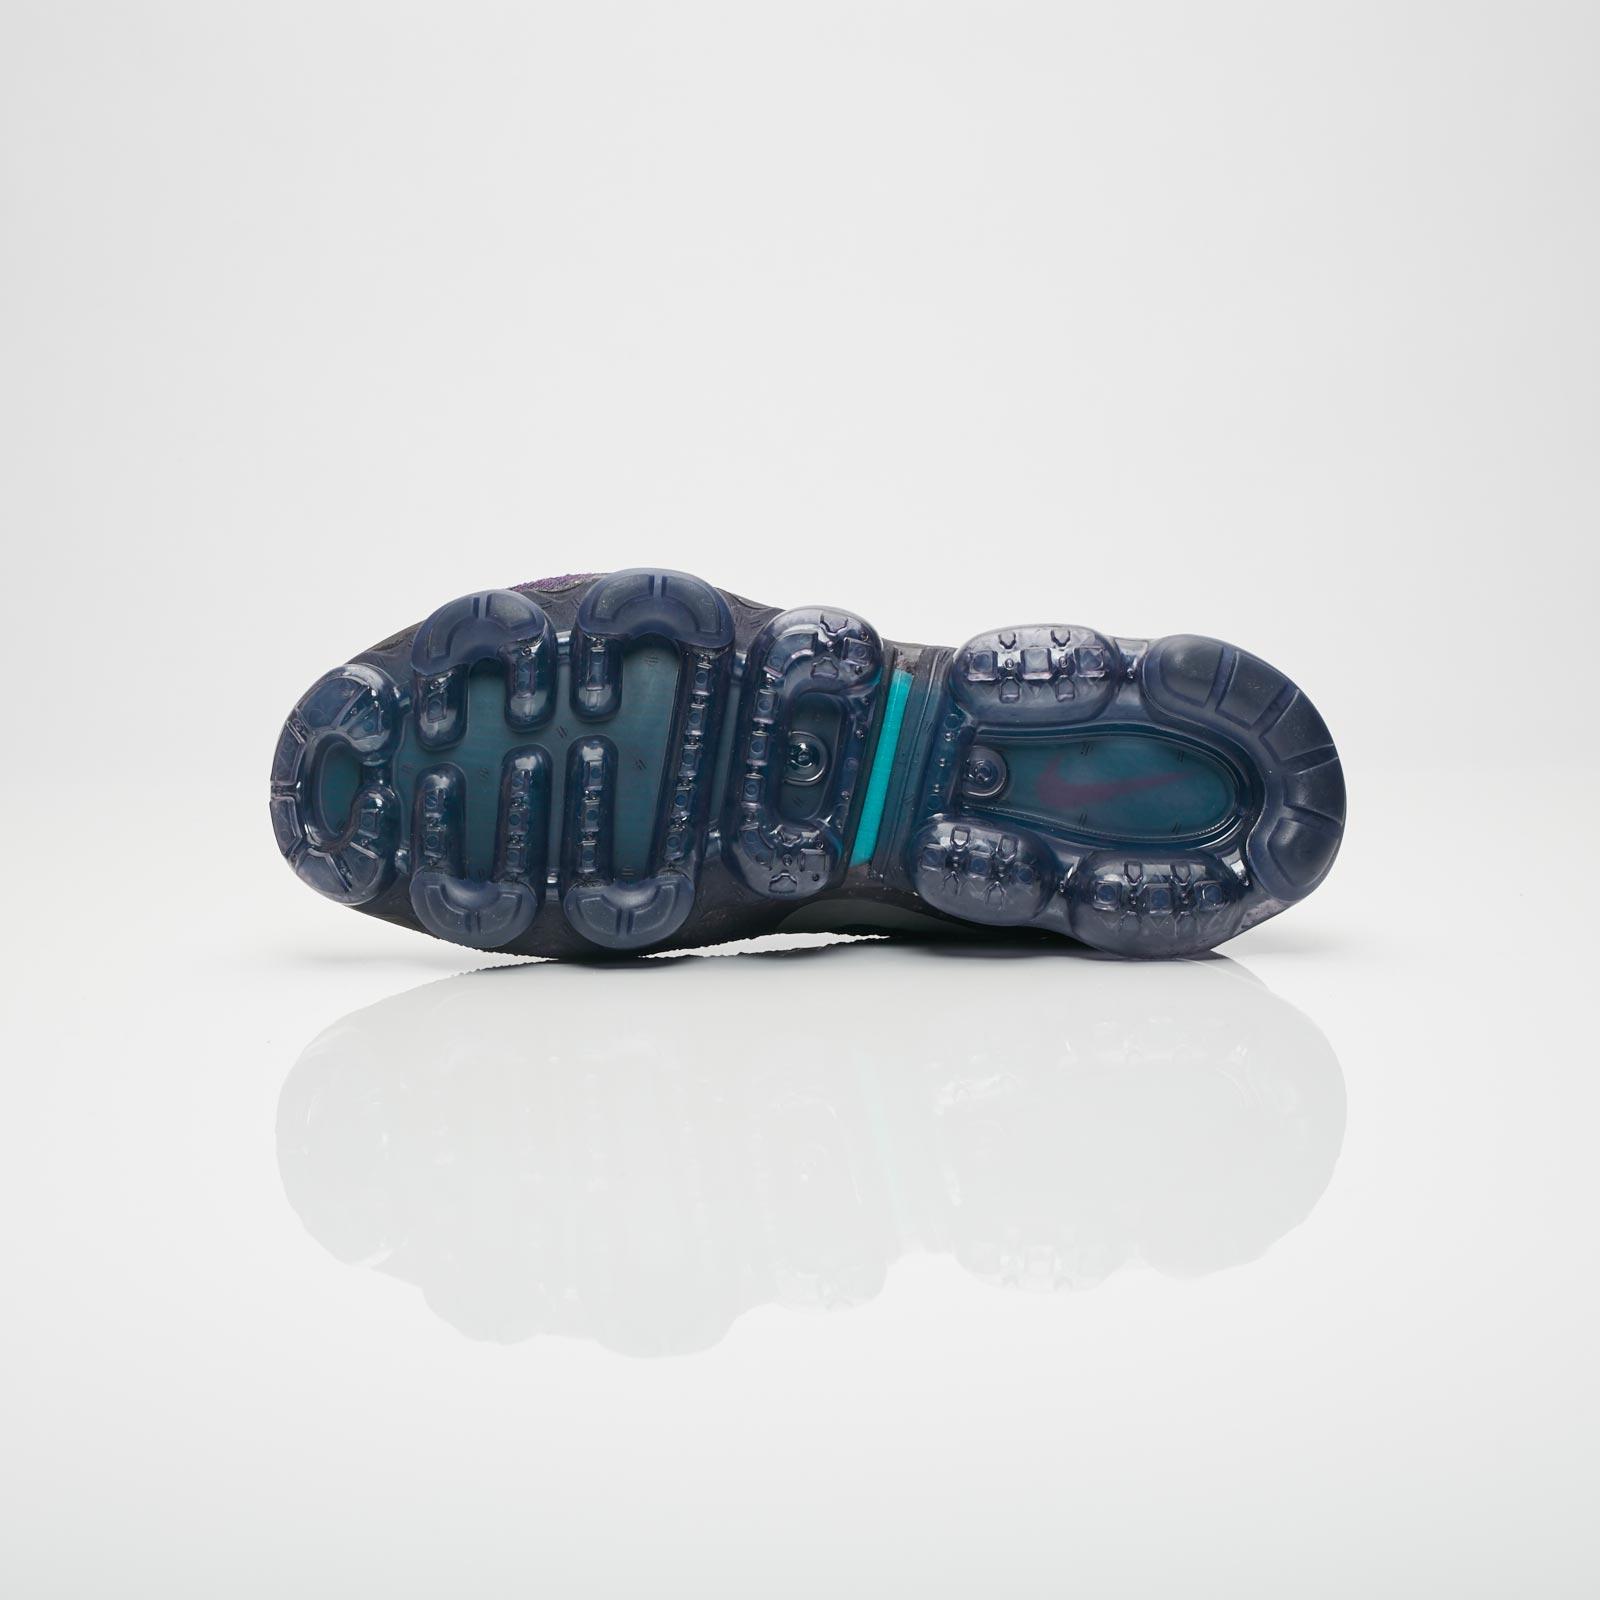 07e72b3ed57b9 Nike Air Vapormax Flyknit - 899473-402 - Sneakersnstuff